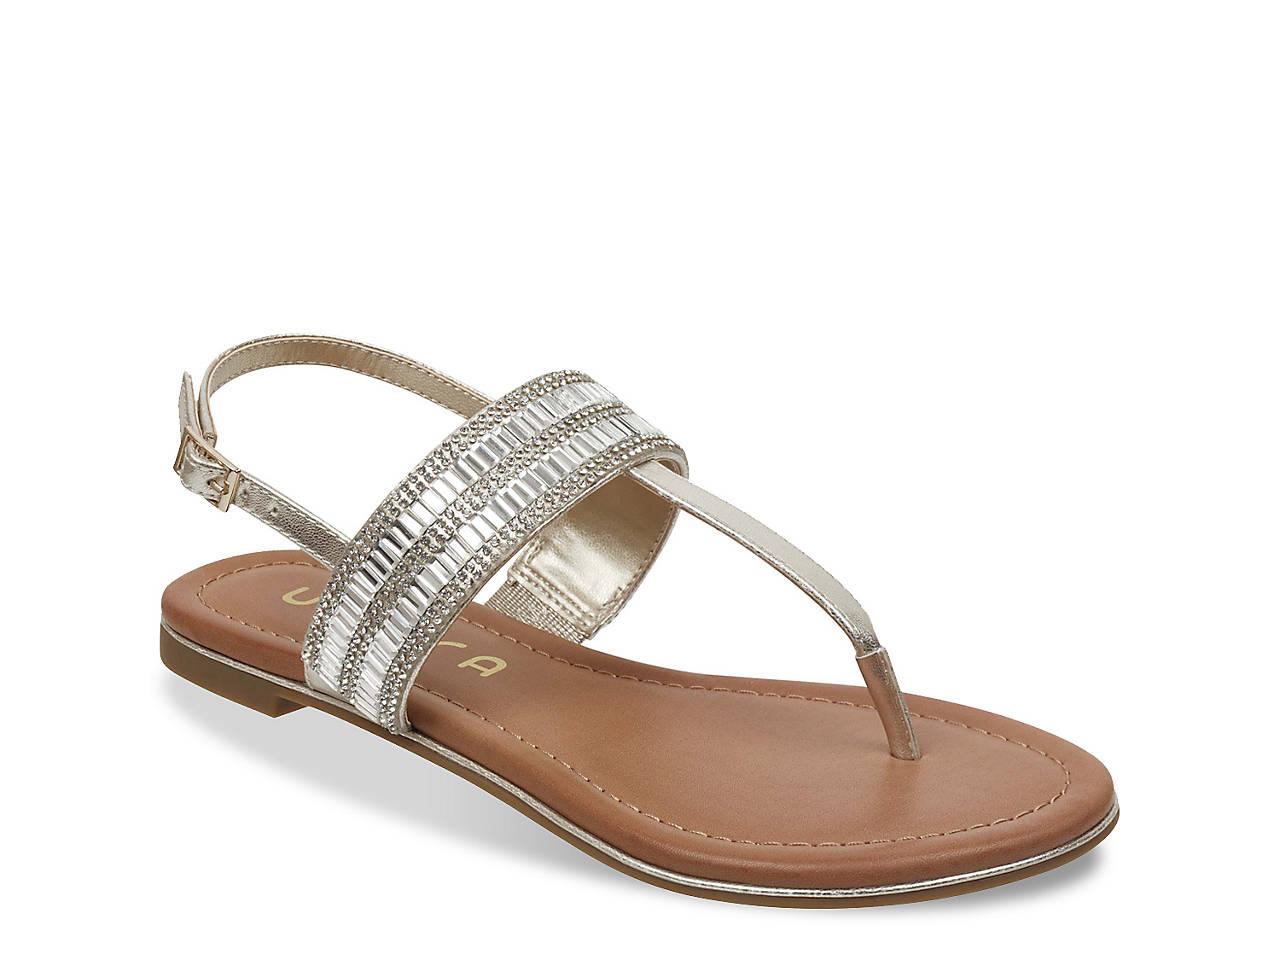 f4ed1a8bb49 Unisa Deinaa Sandal Women s Shoes